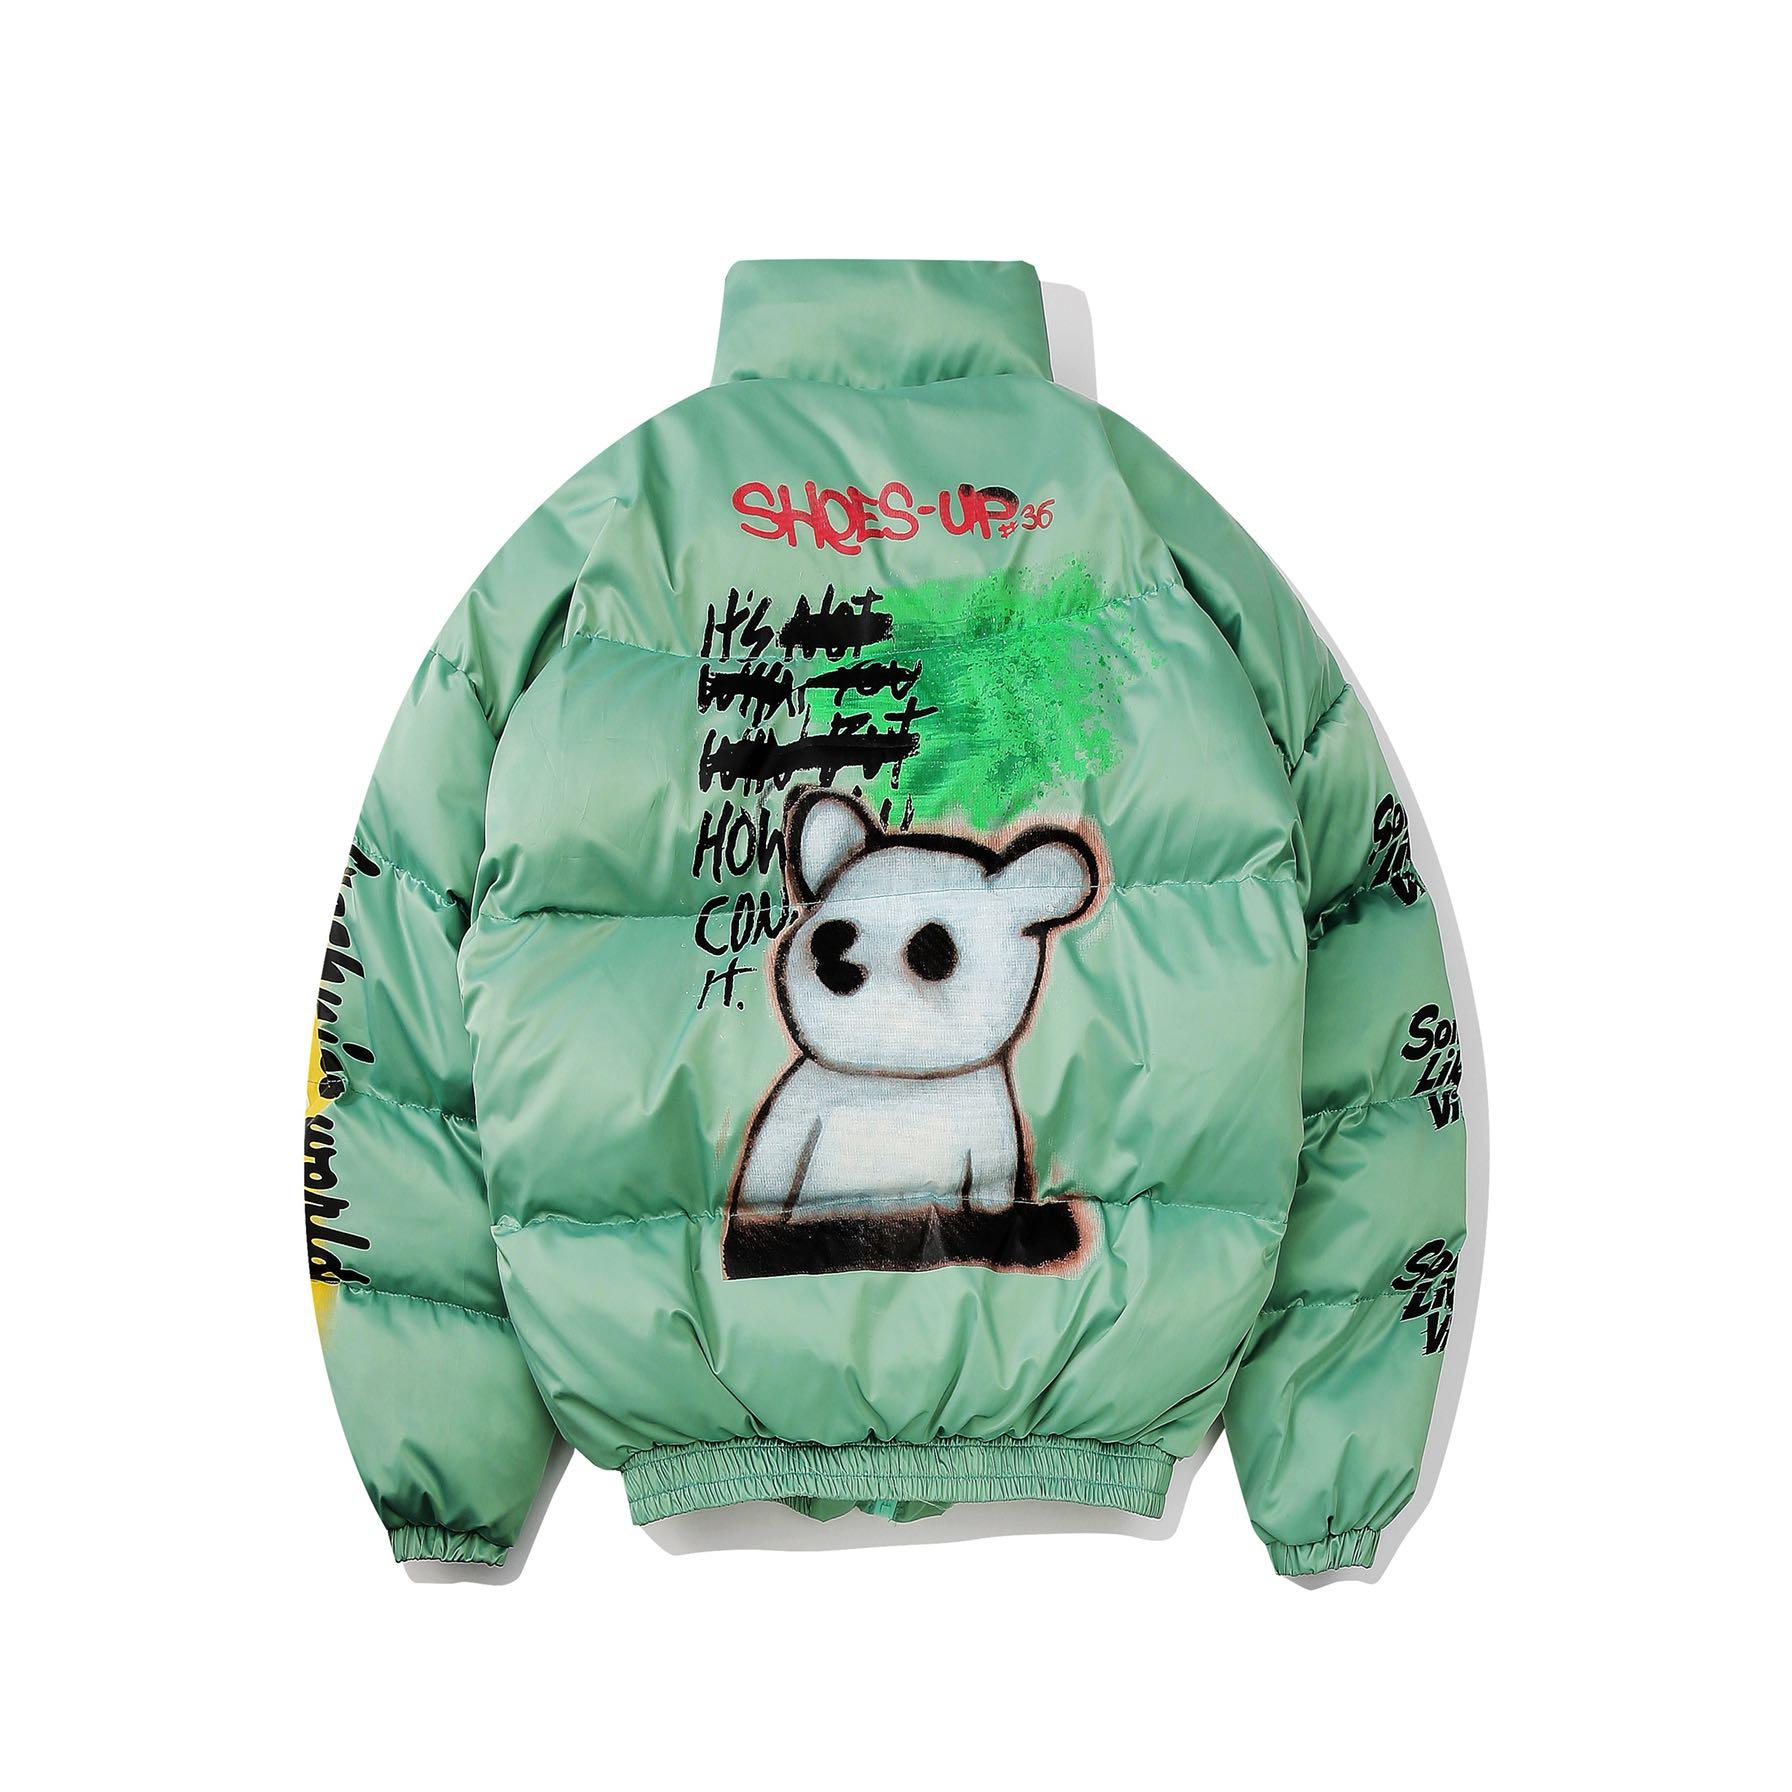 UNCLEDONJM Men's Warm Winter Jacket Funny Printed Bomber Thick Coat Male Parkas Streetwear Jackets Hip Hop Outerwear 311